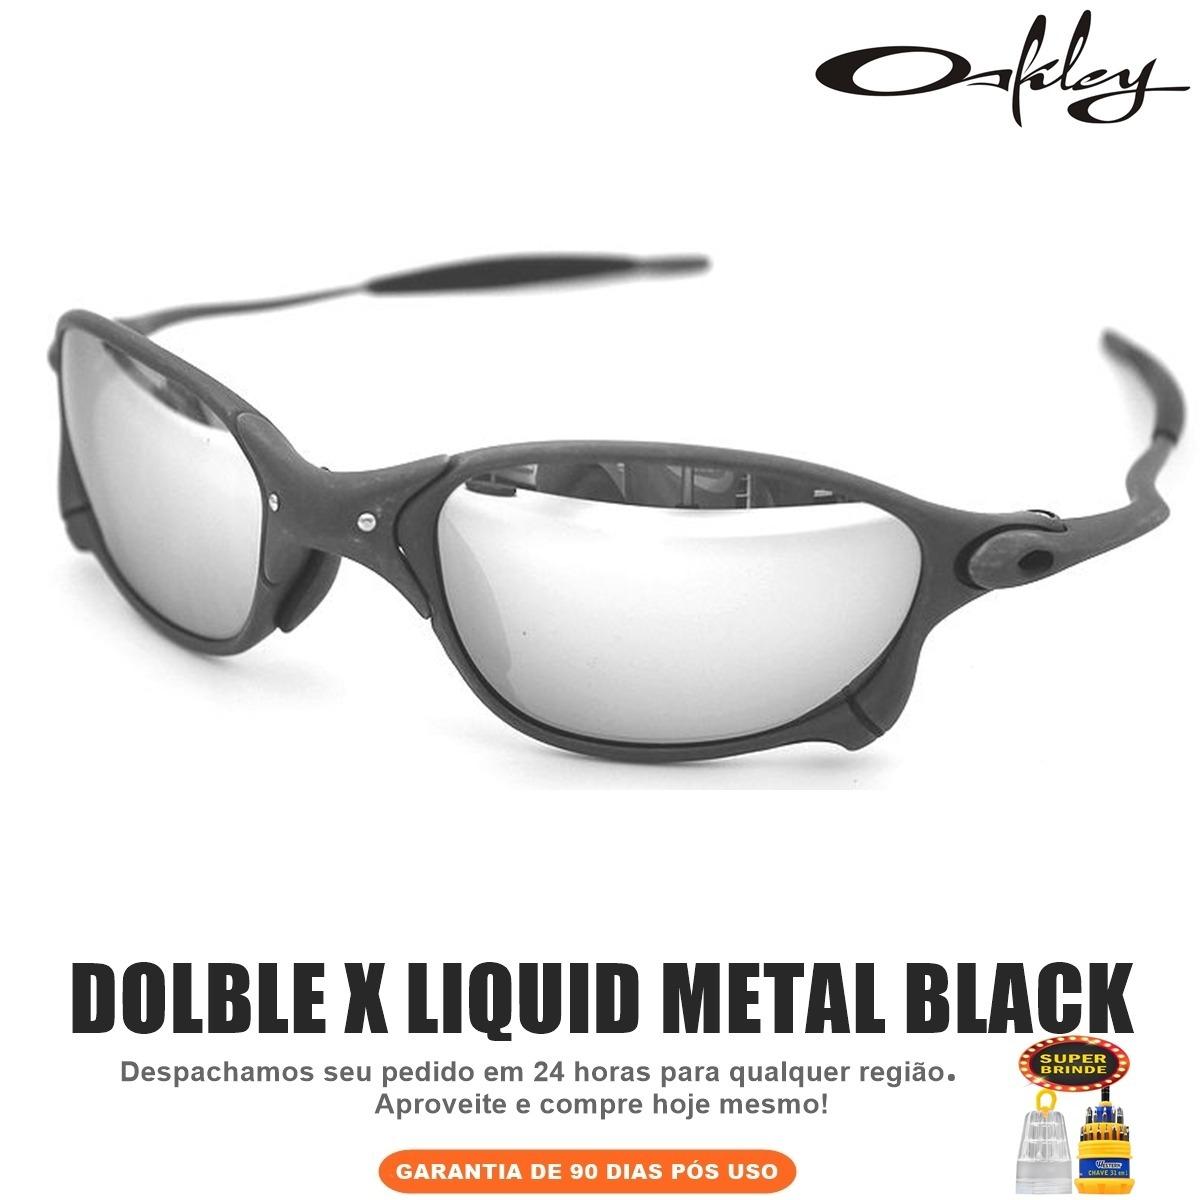 0eec4cc02a94b óculos oakley dolble xx liquid metal prata + frete grátis. Carregando zoom.